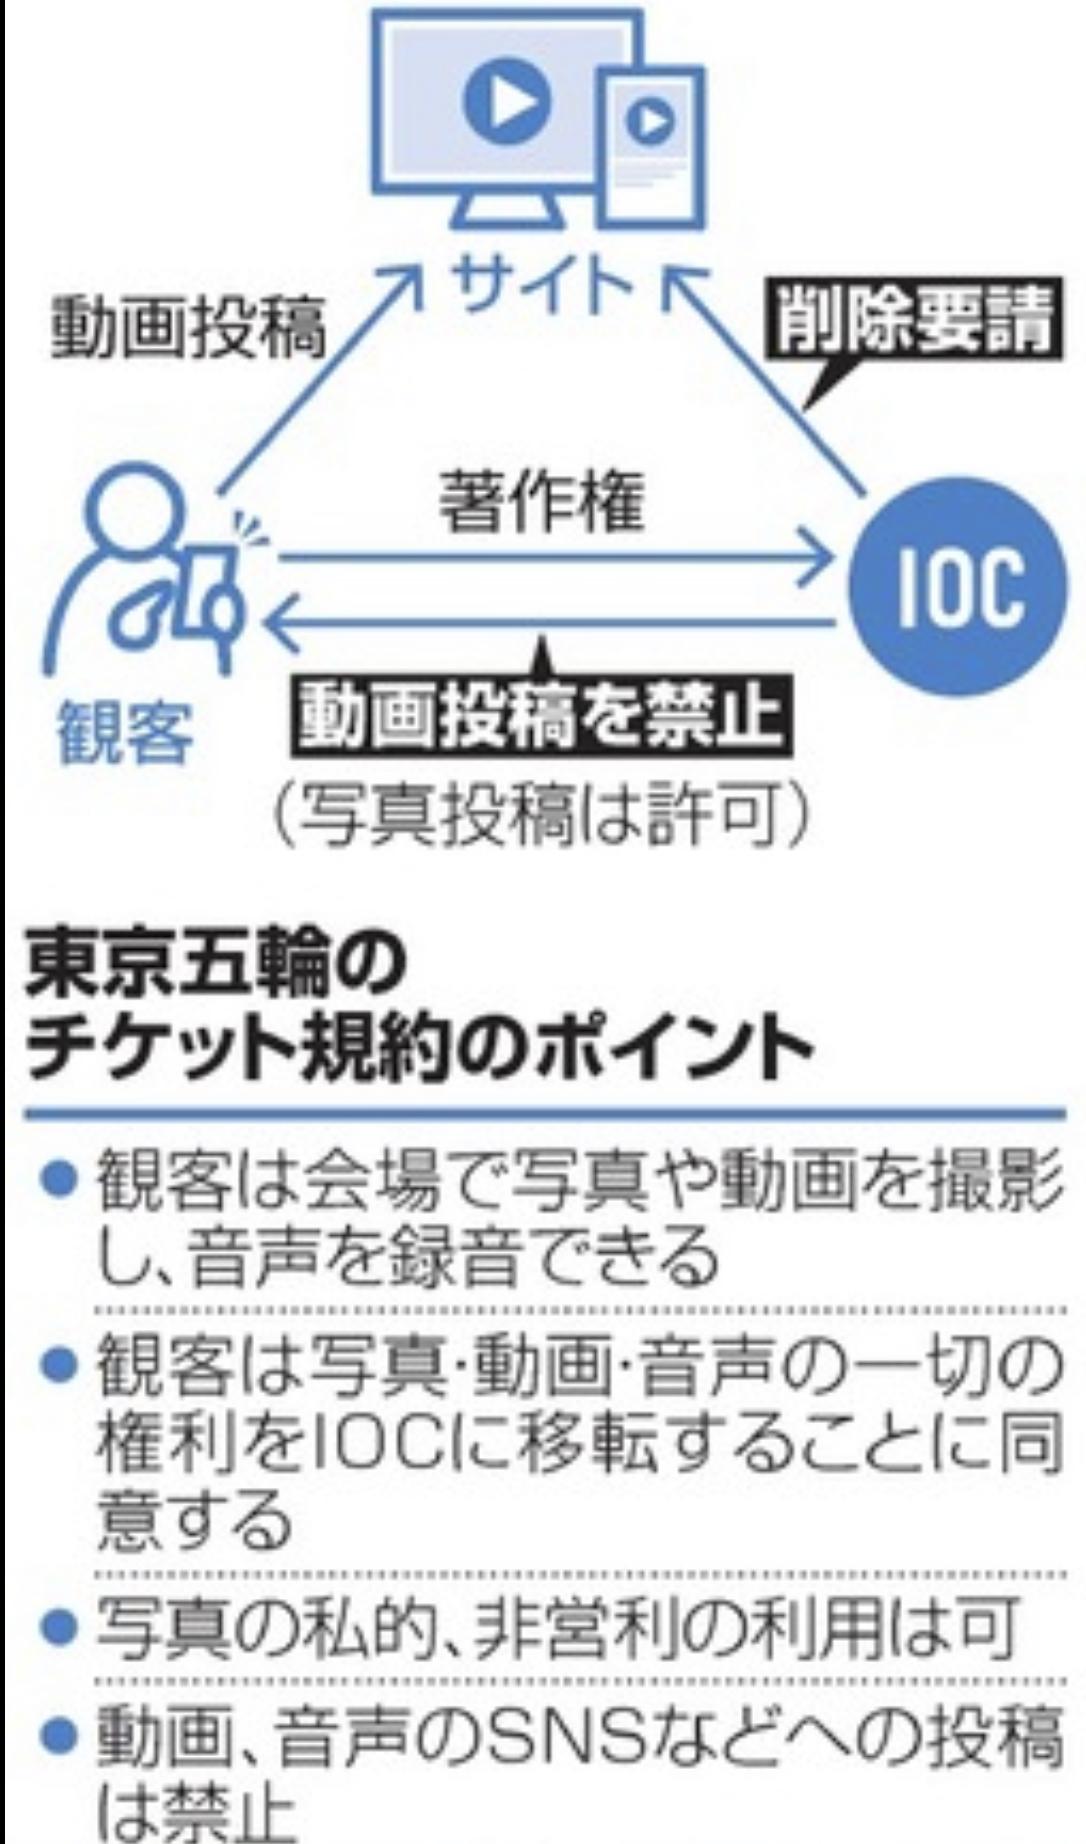 SNS動画投稿禁止の東京オリンピック2020のチケット規約